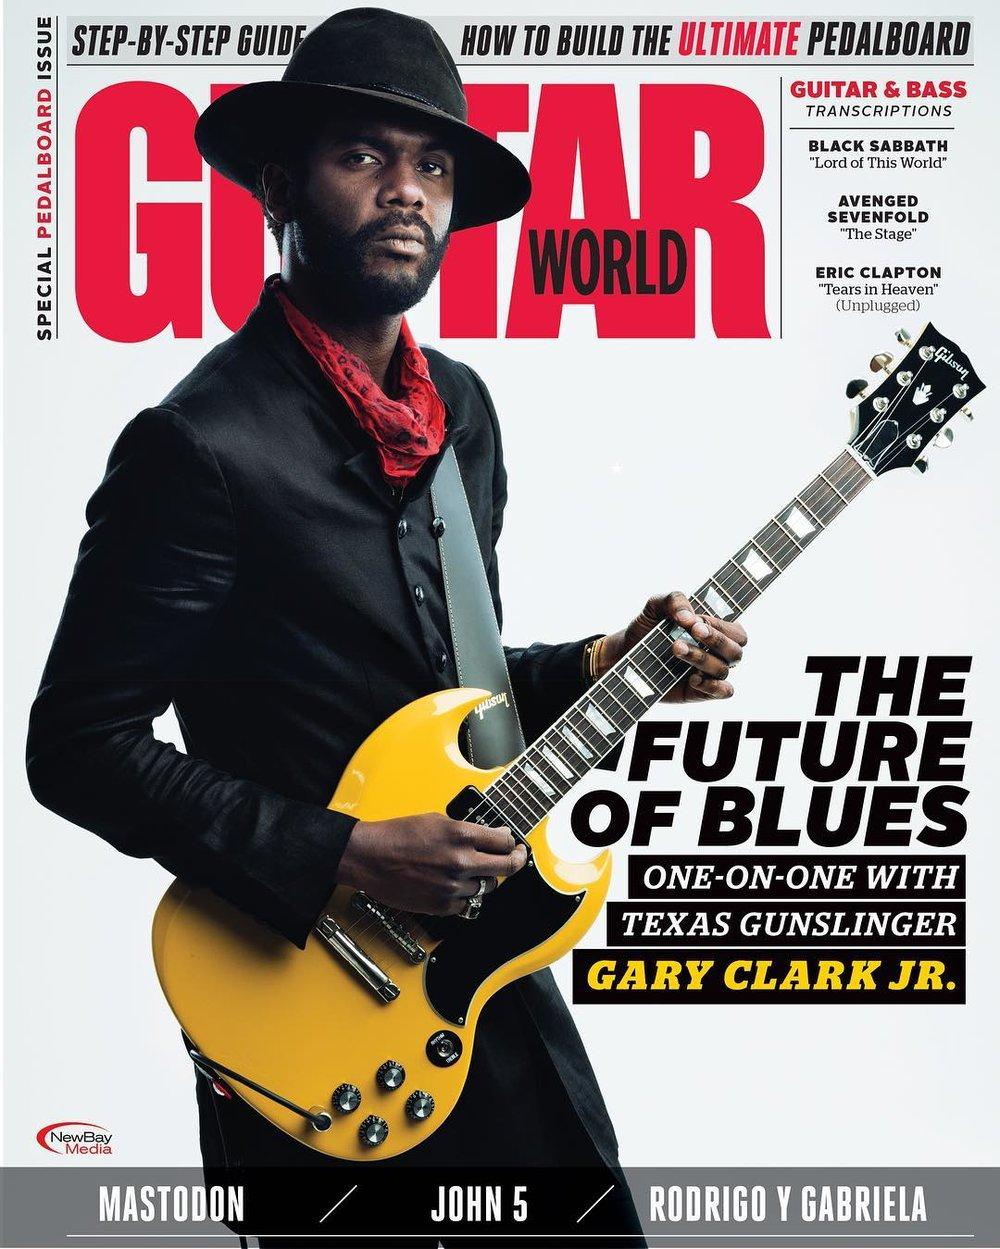 Gary Clark Jr Guitar World May 2017 by Kevin Scanlon1.jpg